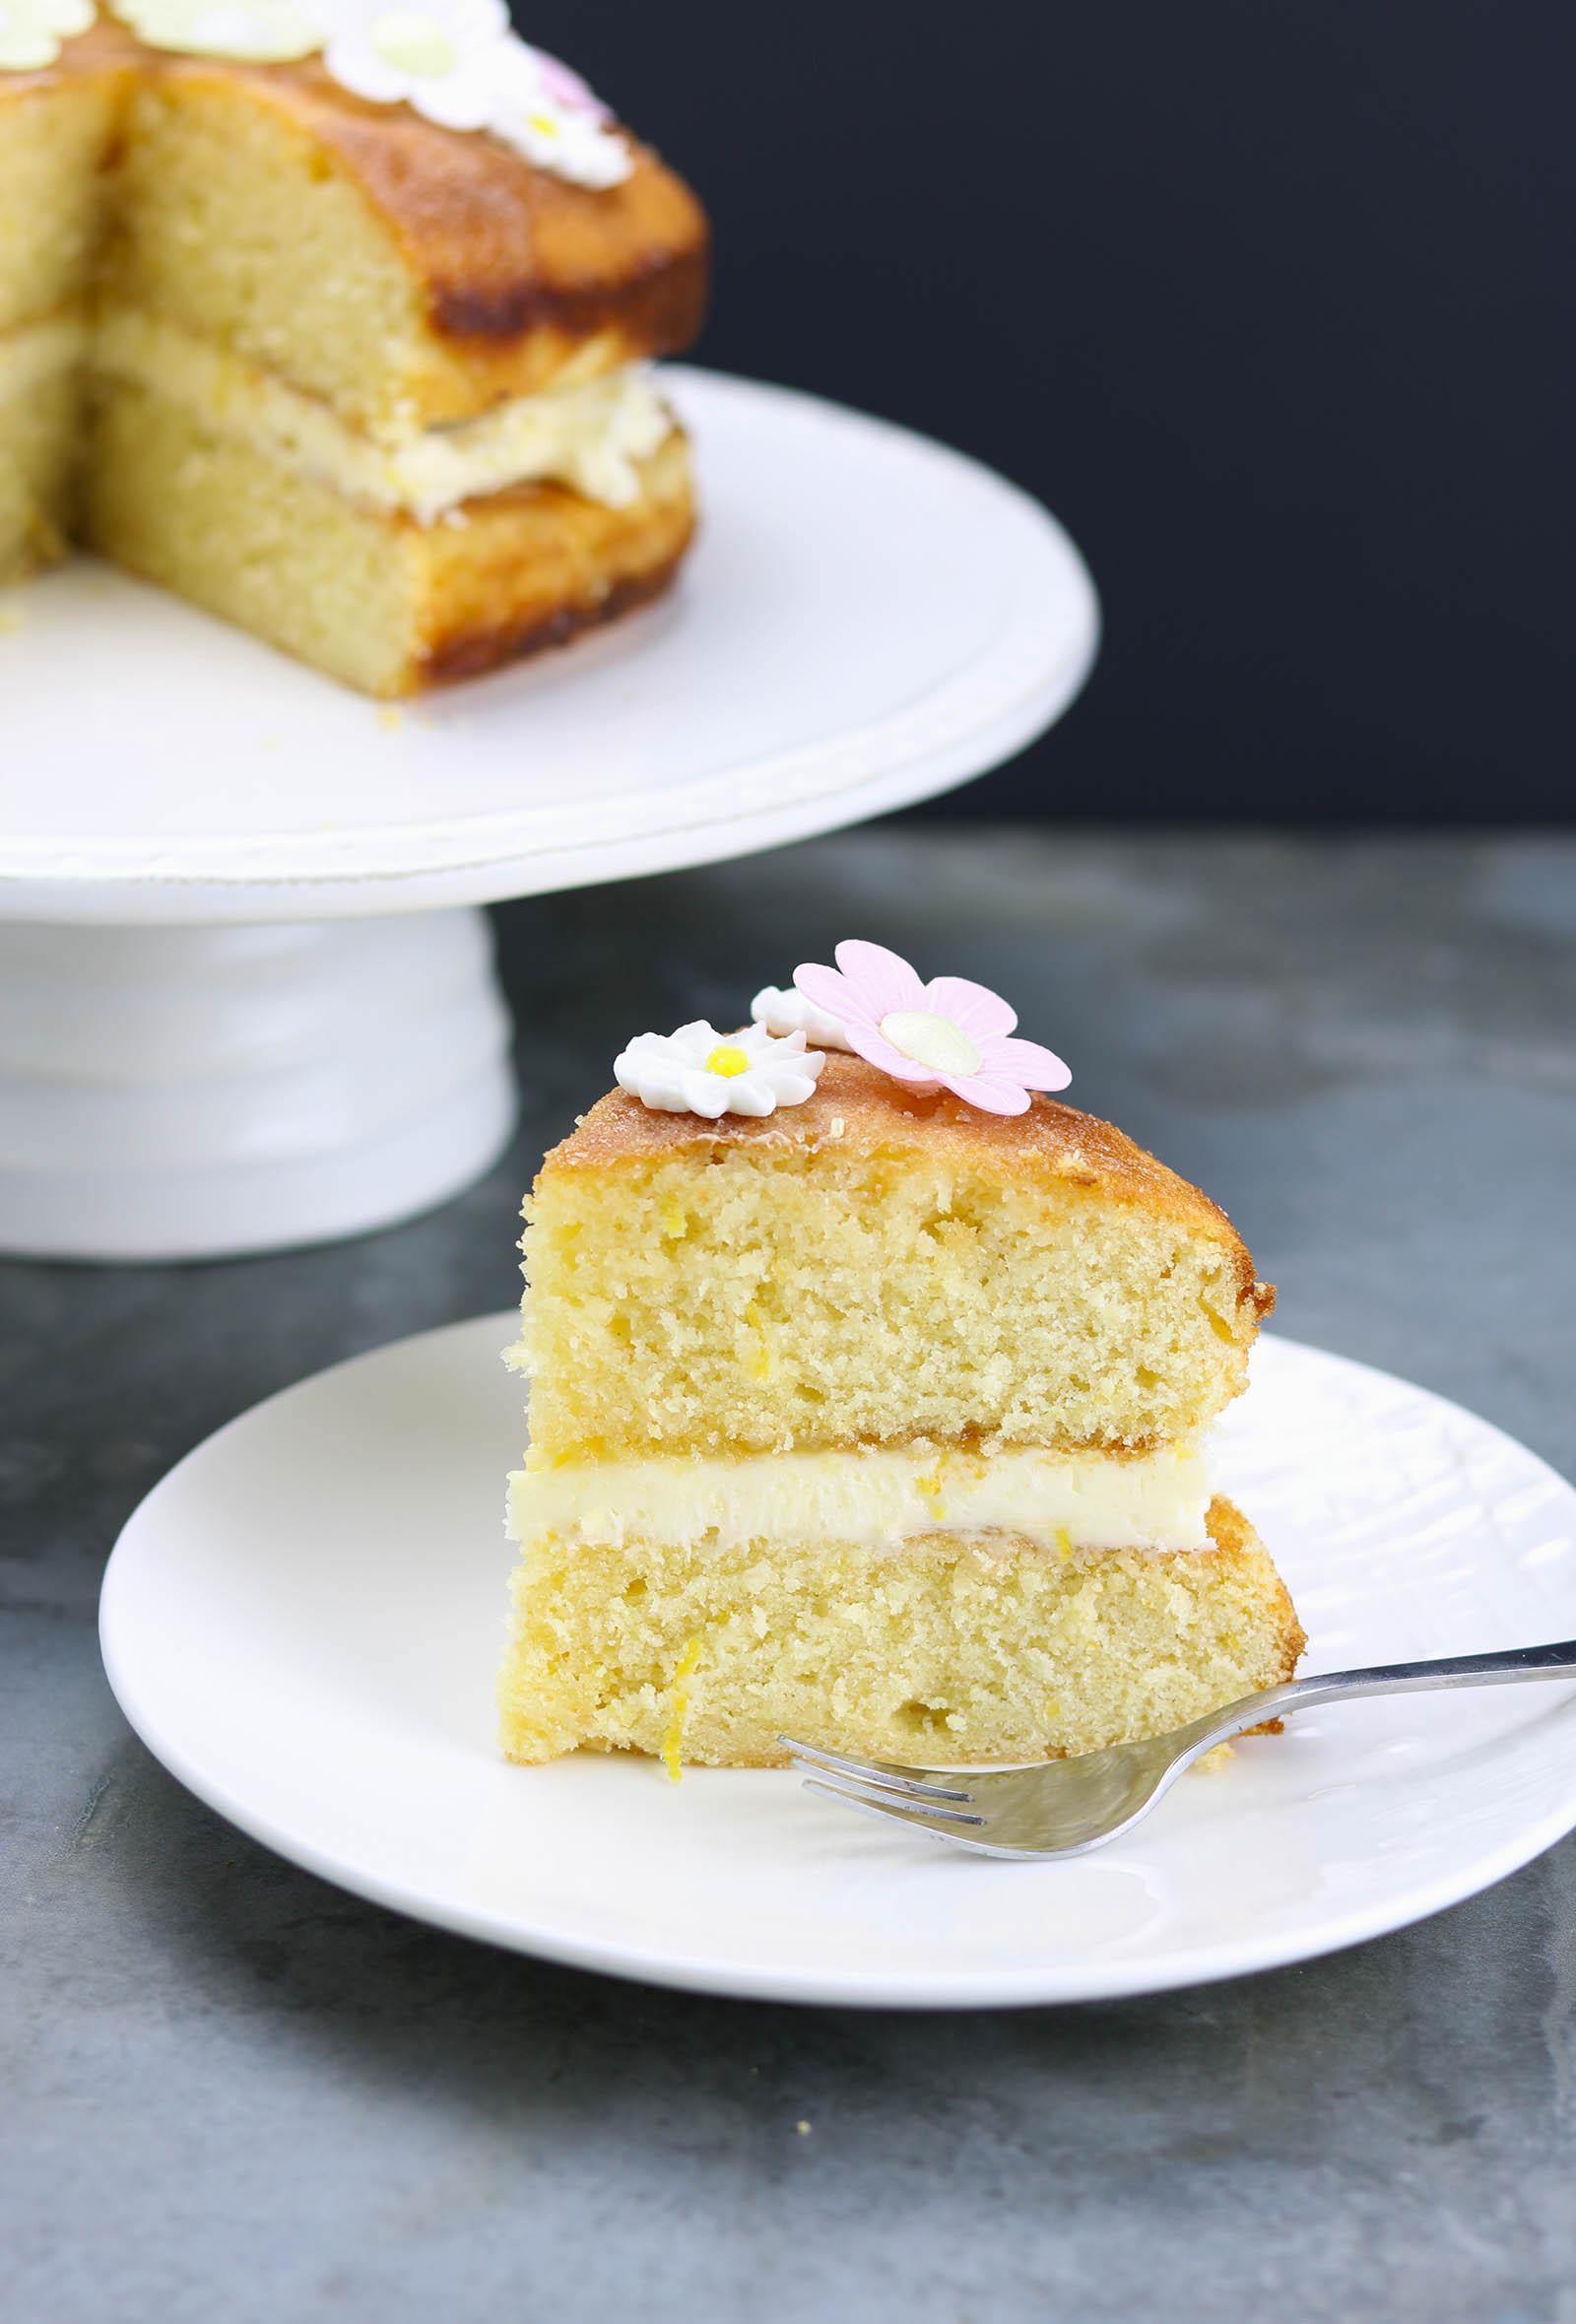 Lemon Drizzle Birthday Cake The Last Food Blog